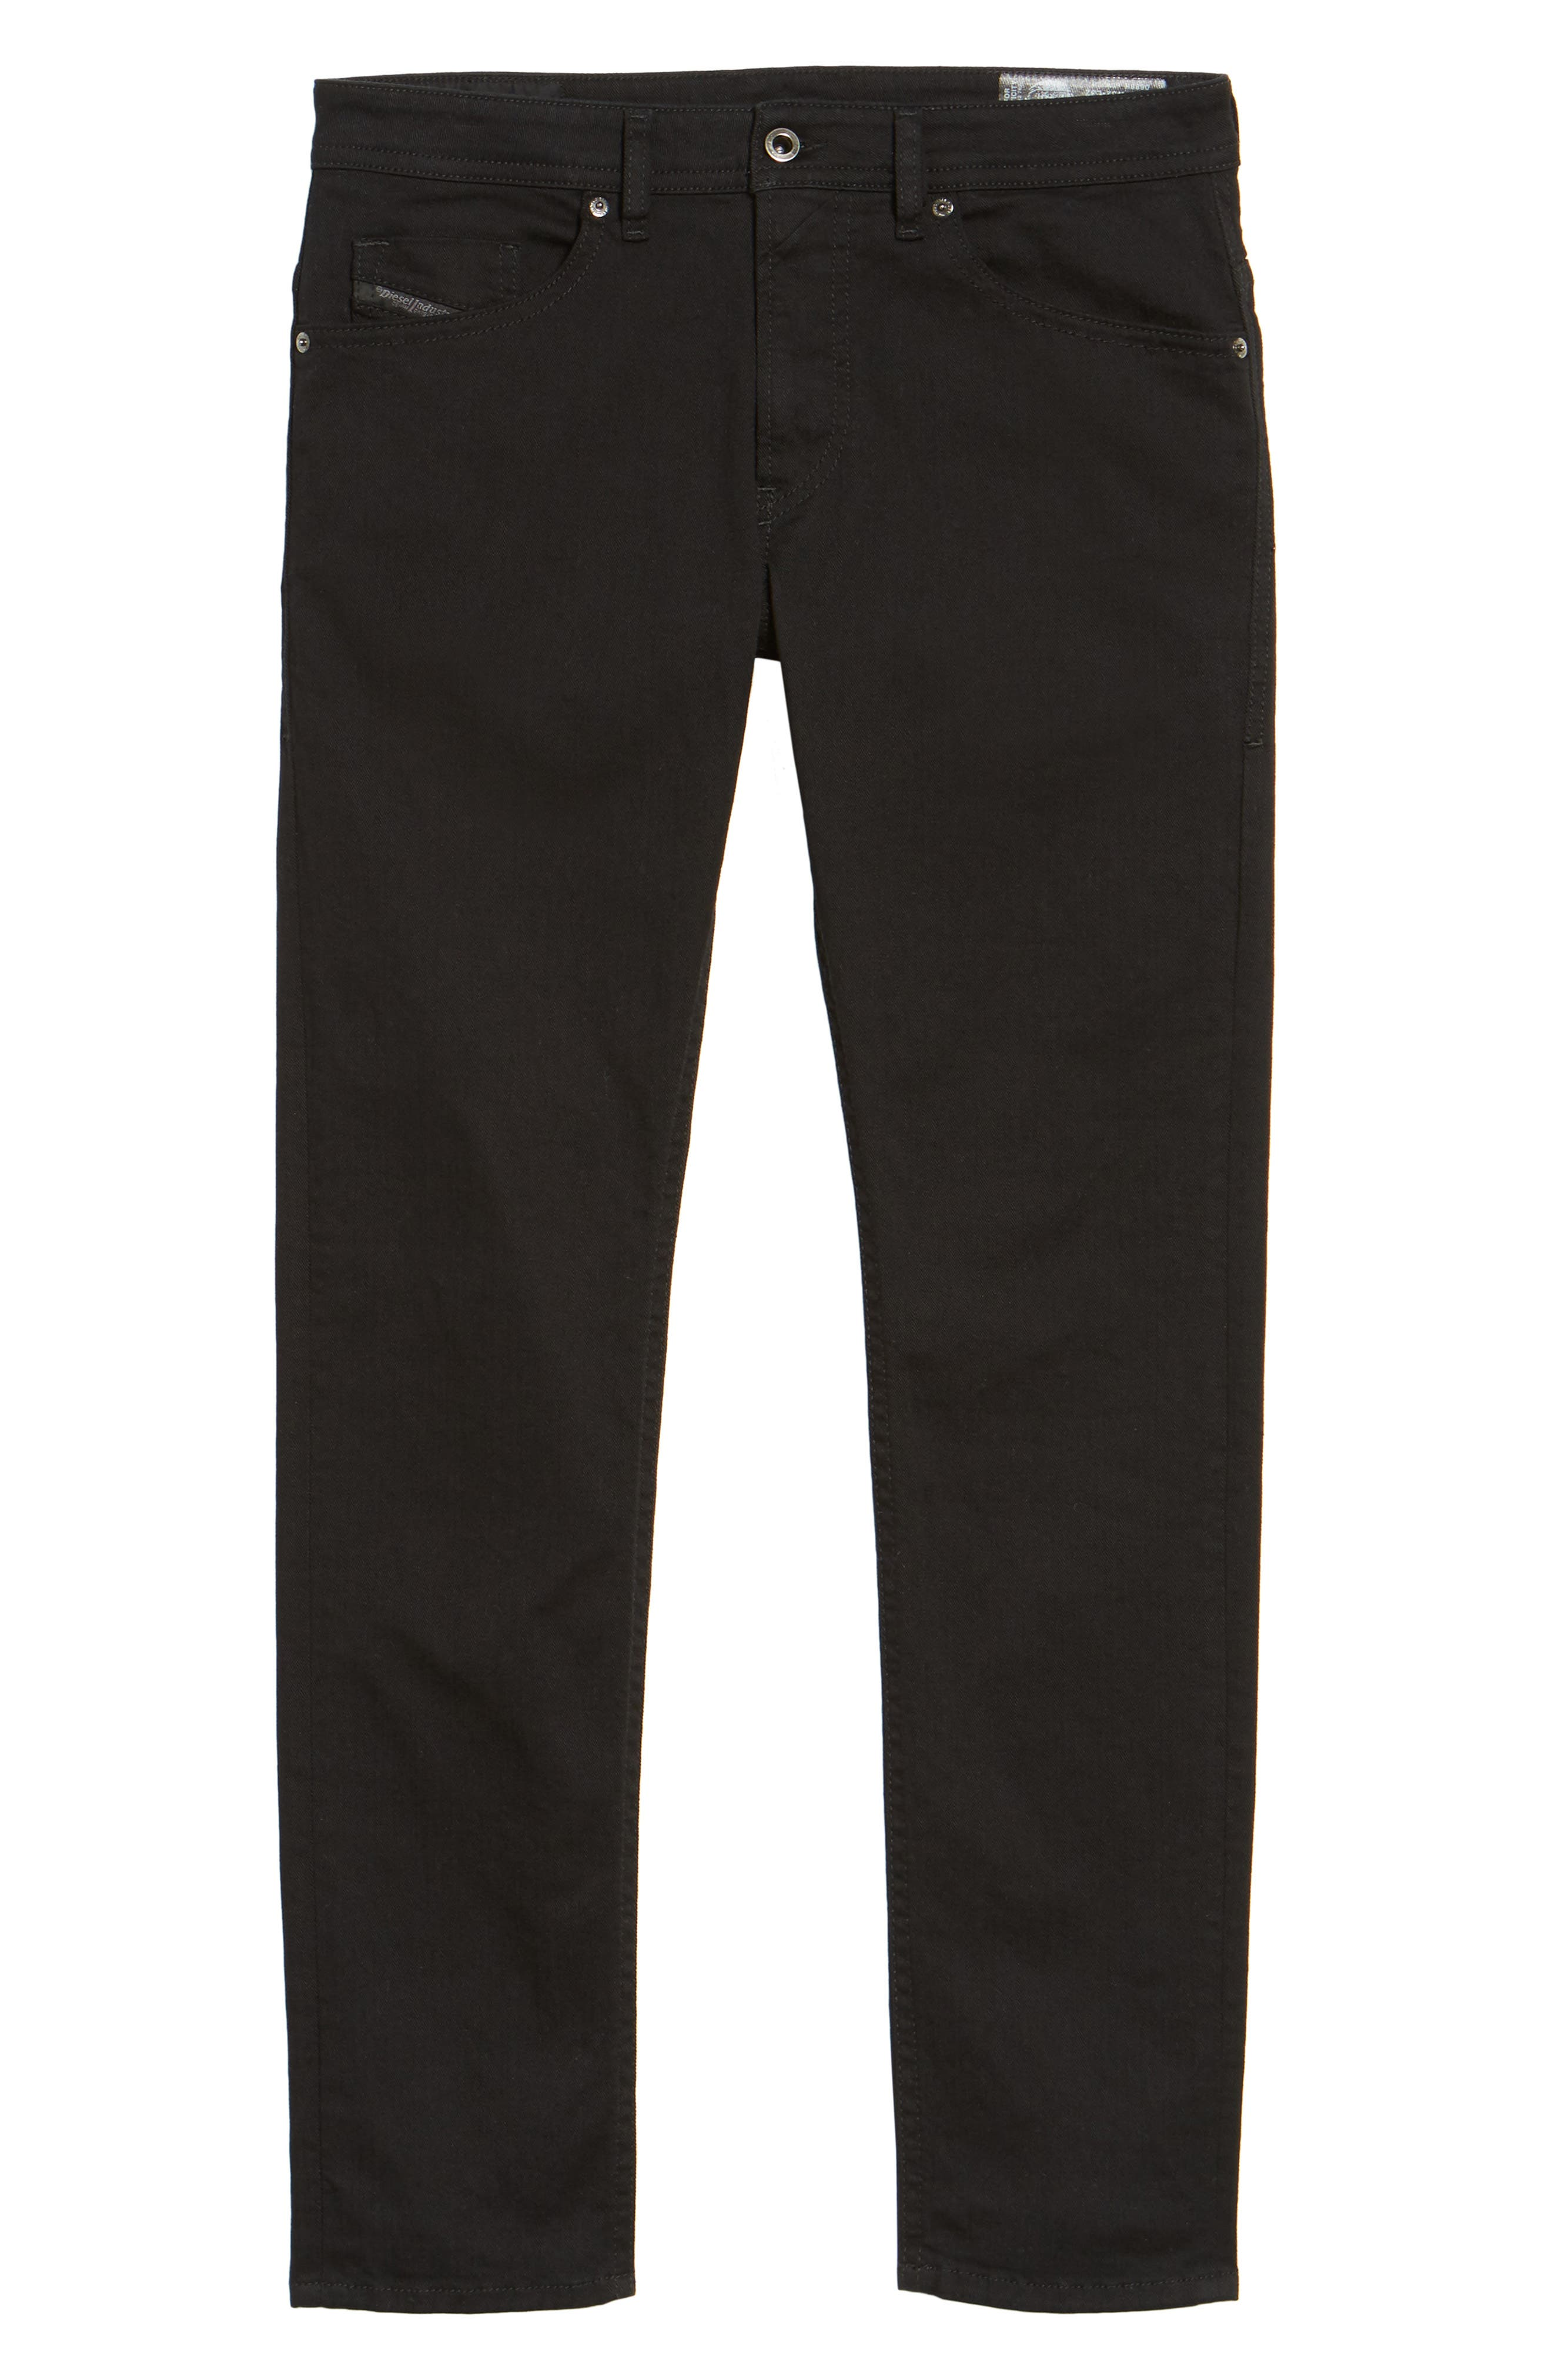 DIESEL<SUP>®</SUP>, Thommer Slim Fit Jeans, Alternate thumbnail 7, color, BLACK/ DENIM